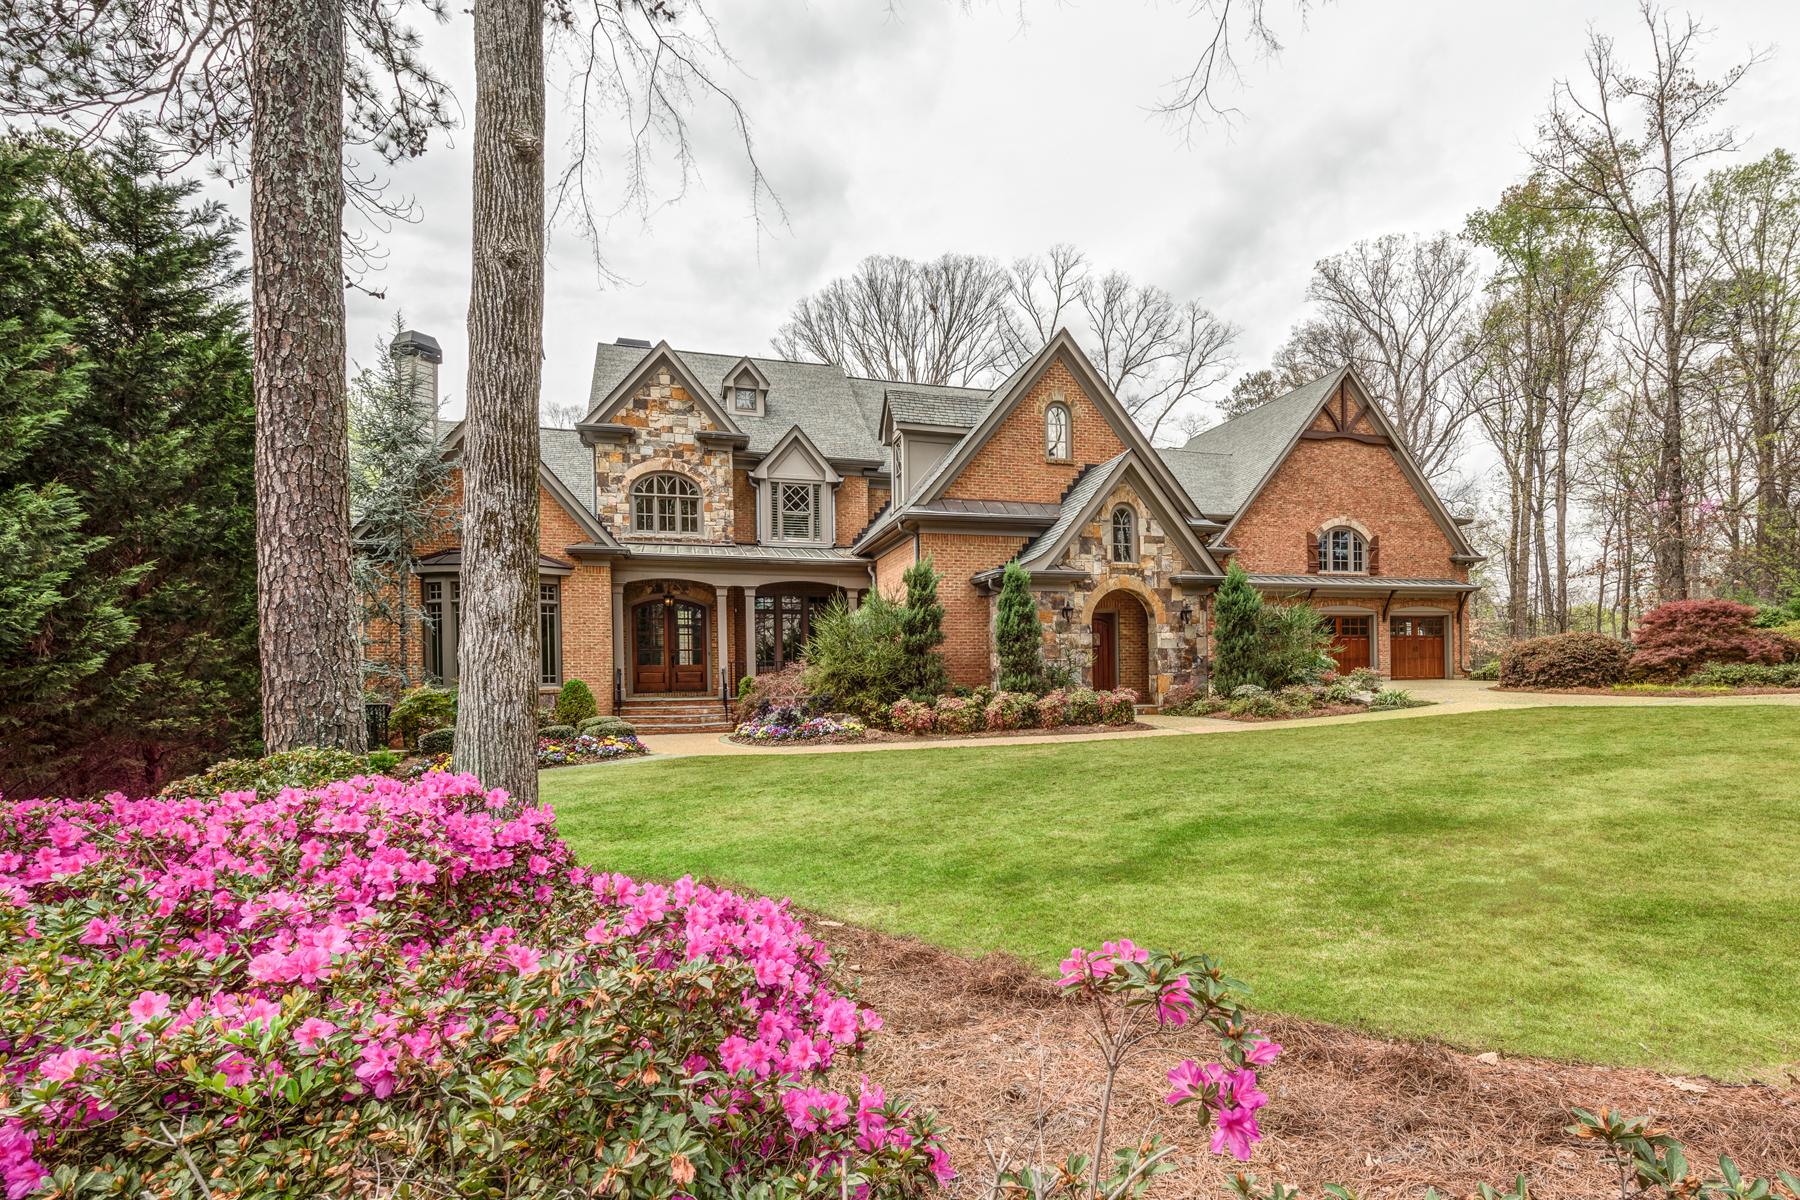 獨棟家庭住宅 為 出售 在 Exclusive Buckhead Retreat 280 Old Ivy Road Buckhead, Atlanta, 喬治亞州, 30342 美國